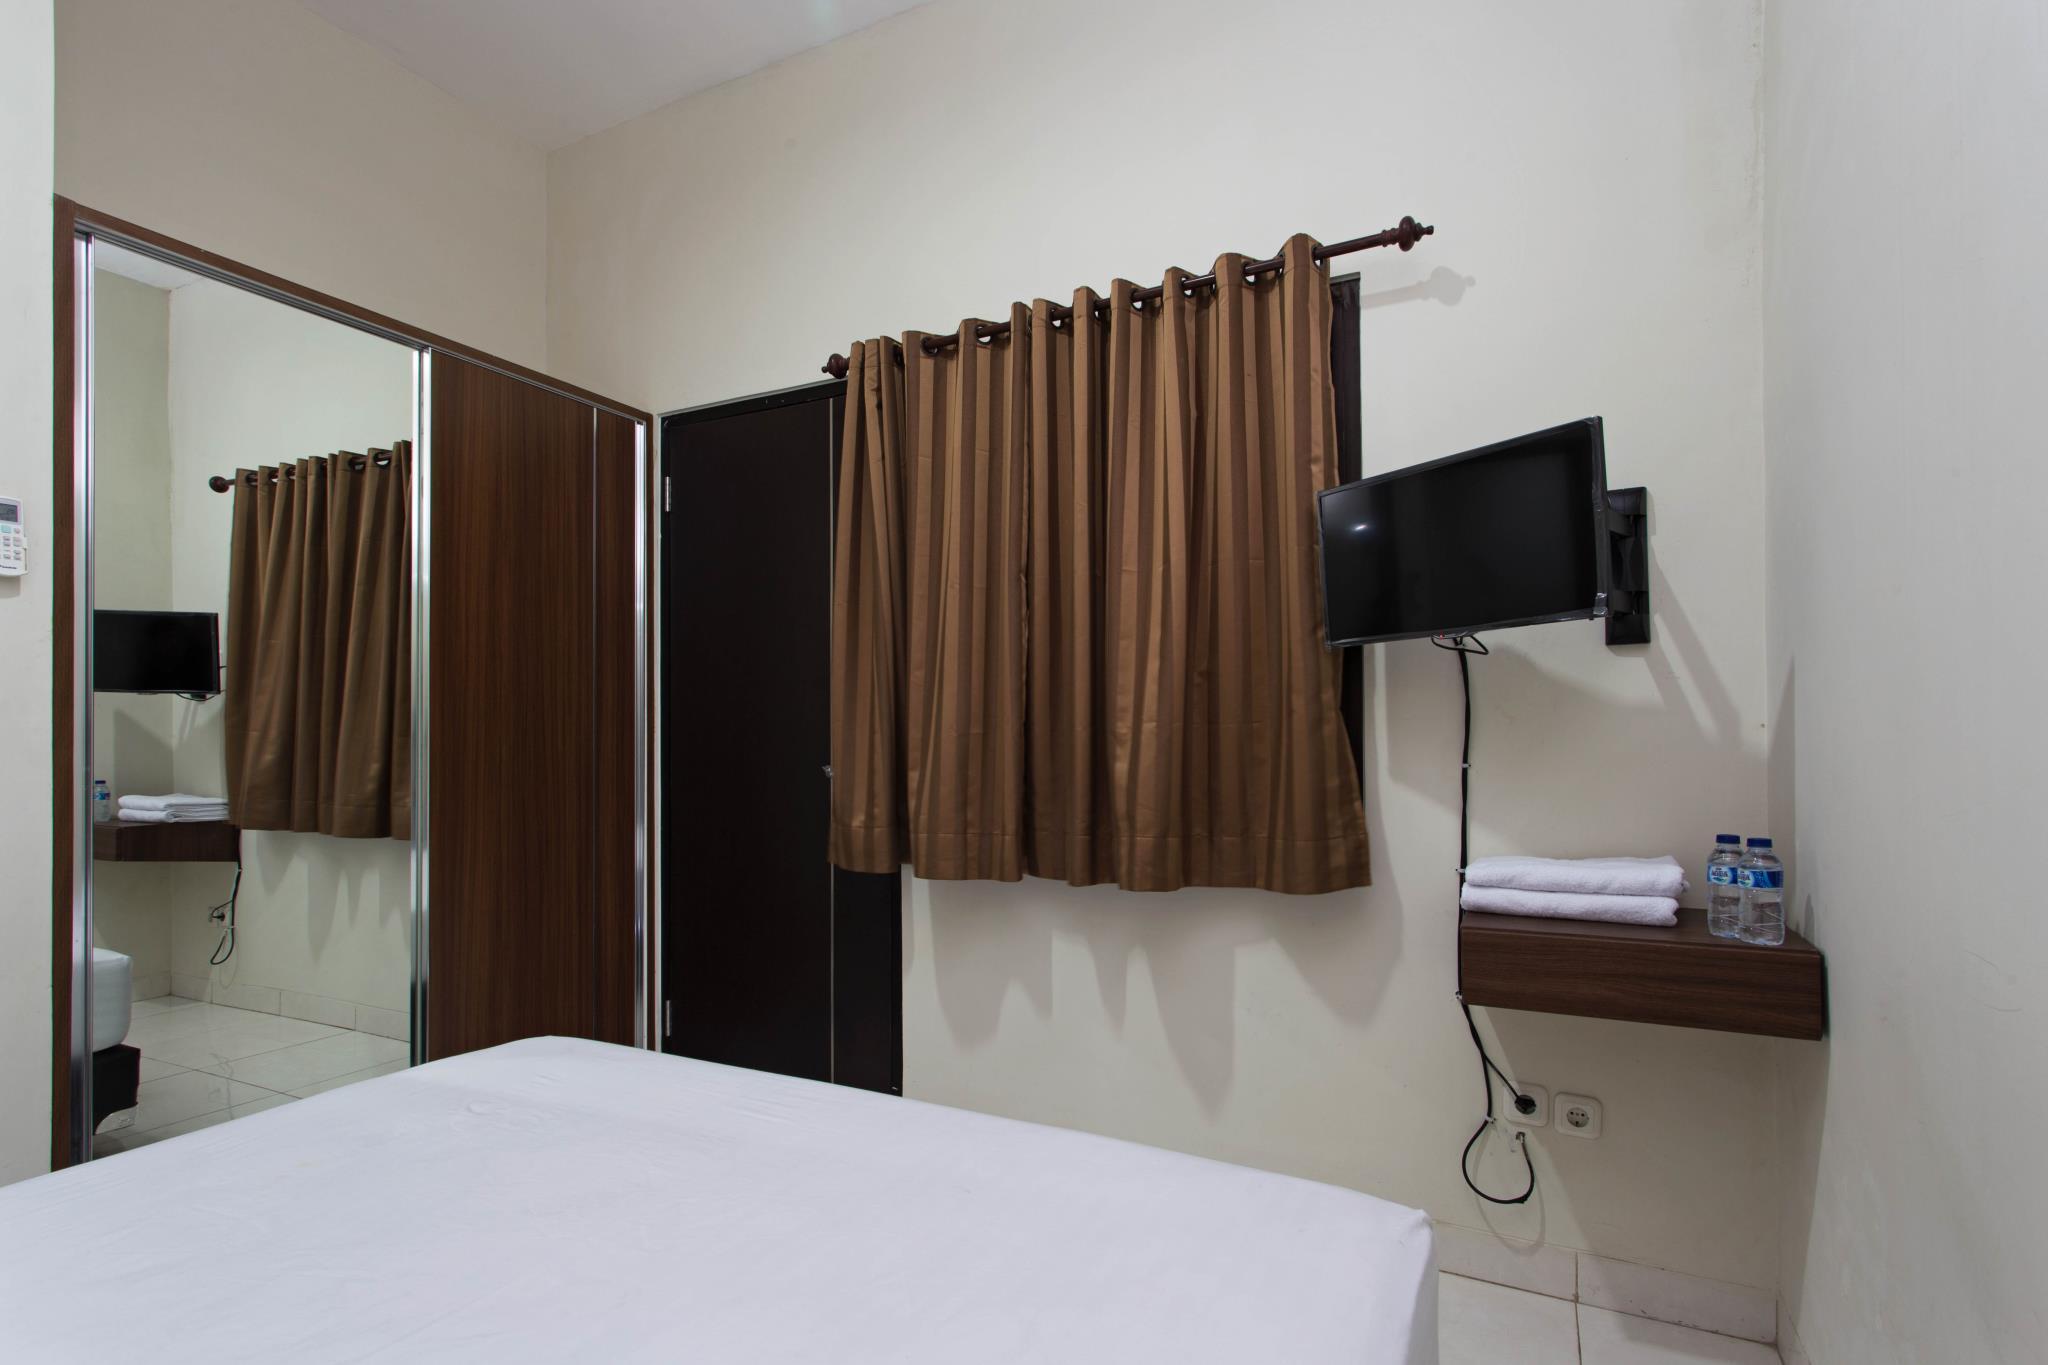 Hotel RedDoorz Near Cengkareng Airport - Jl. Perumahan Mahkota Indah Blok B5 No.6, Rawa Bokor - Jakarta